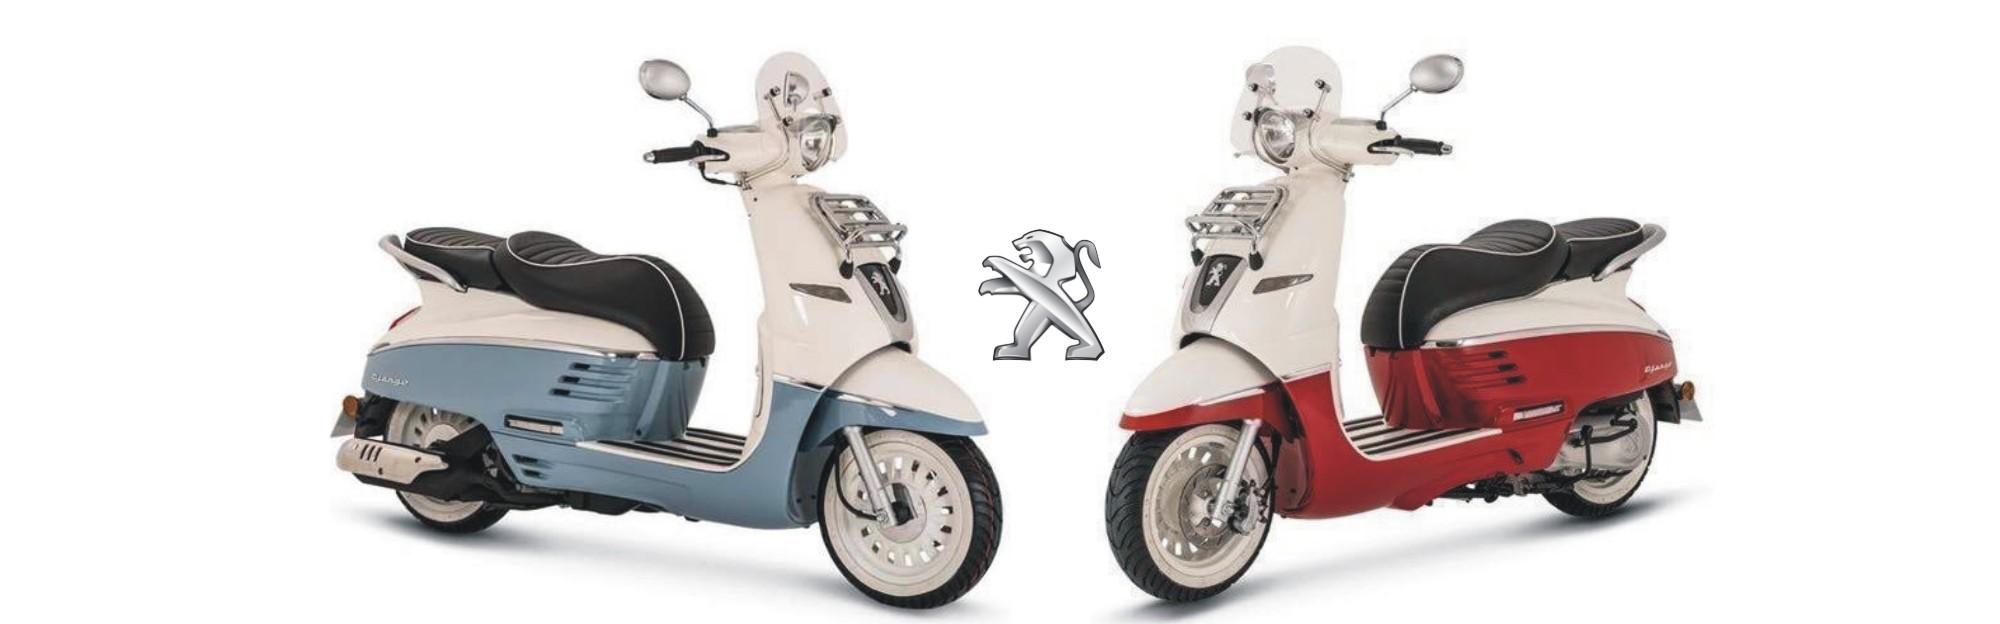 slide peugeot scooters django